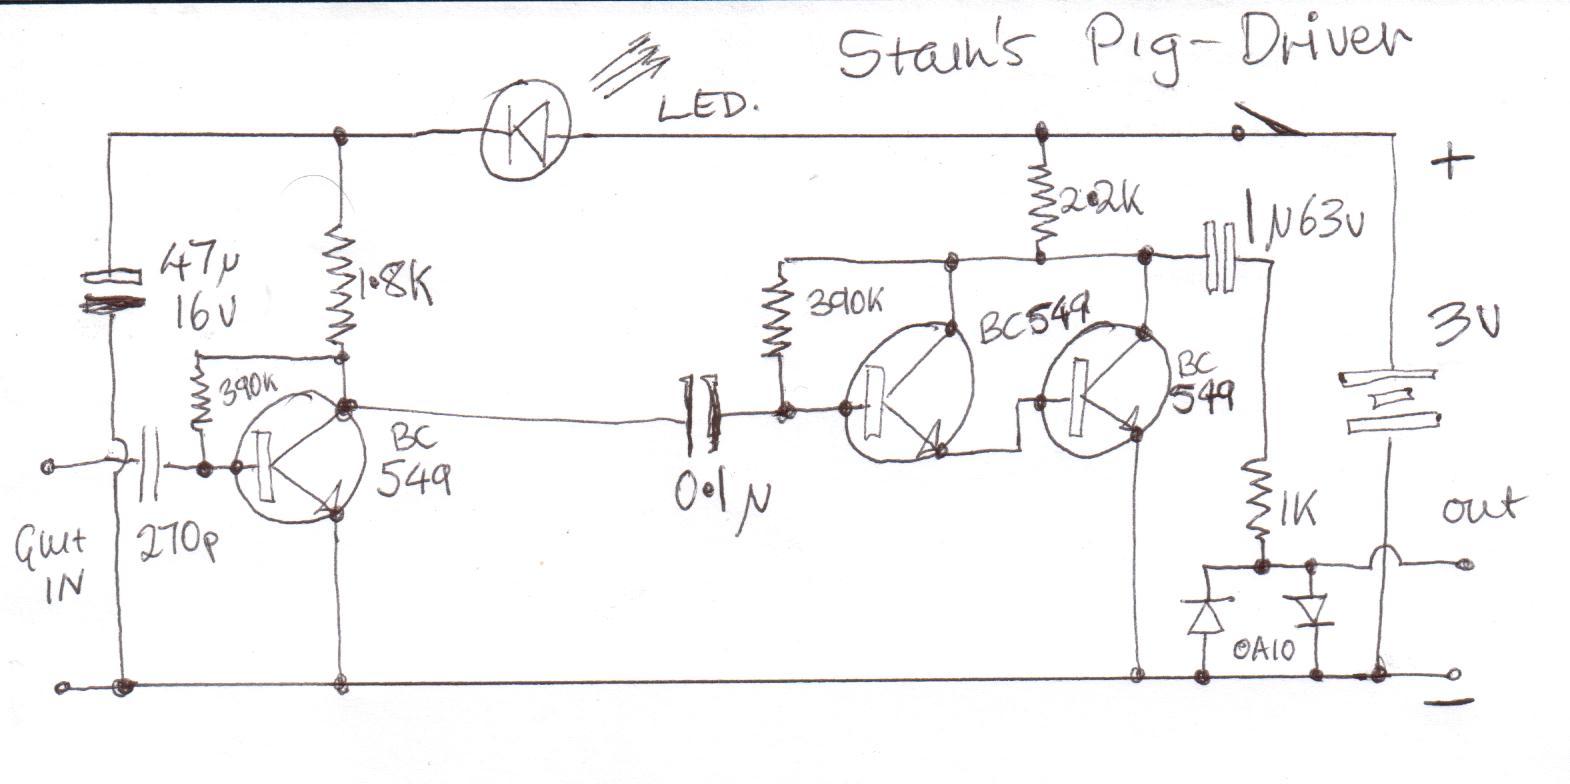 fuzz face wiring diagram 2001 dodge grand caravan radio no led simple winch control